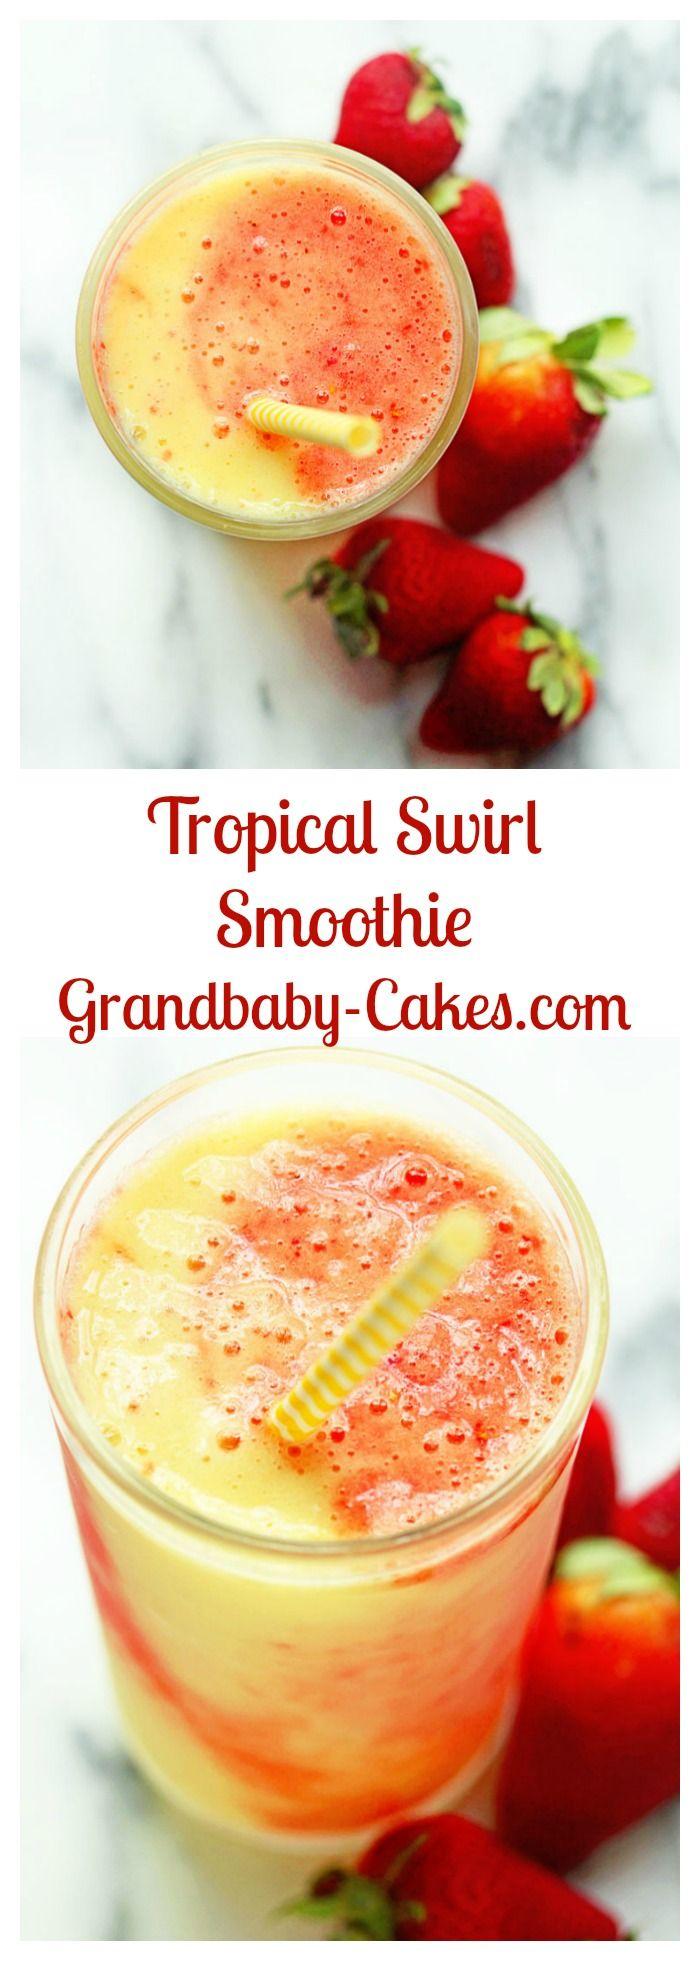 Tropical Strawberry Swirl Smoothies | Grandbaby-Cakes.com